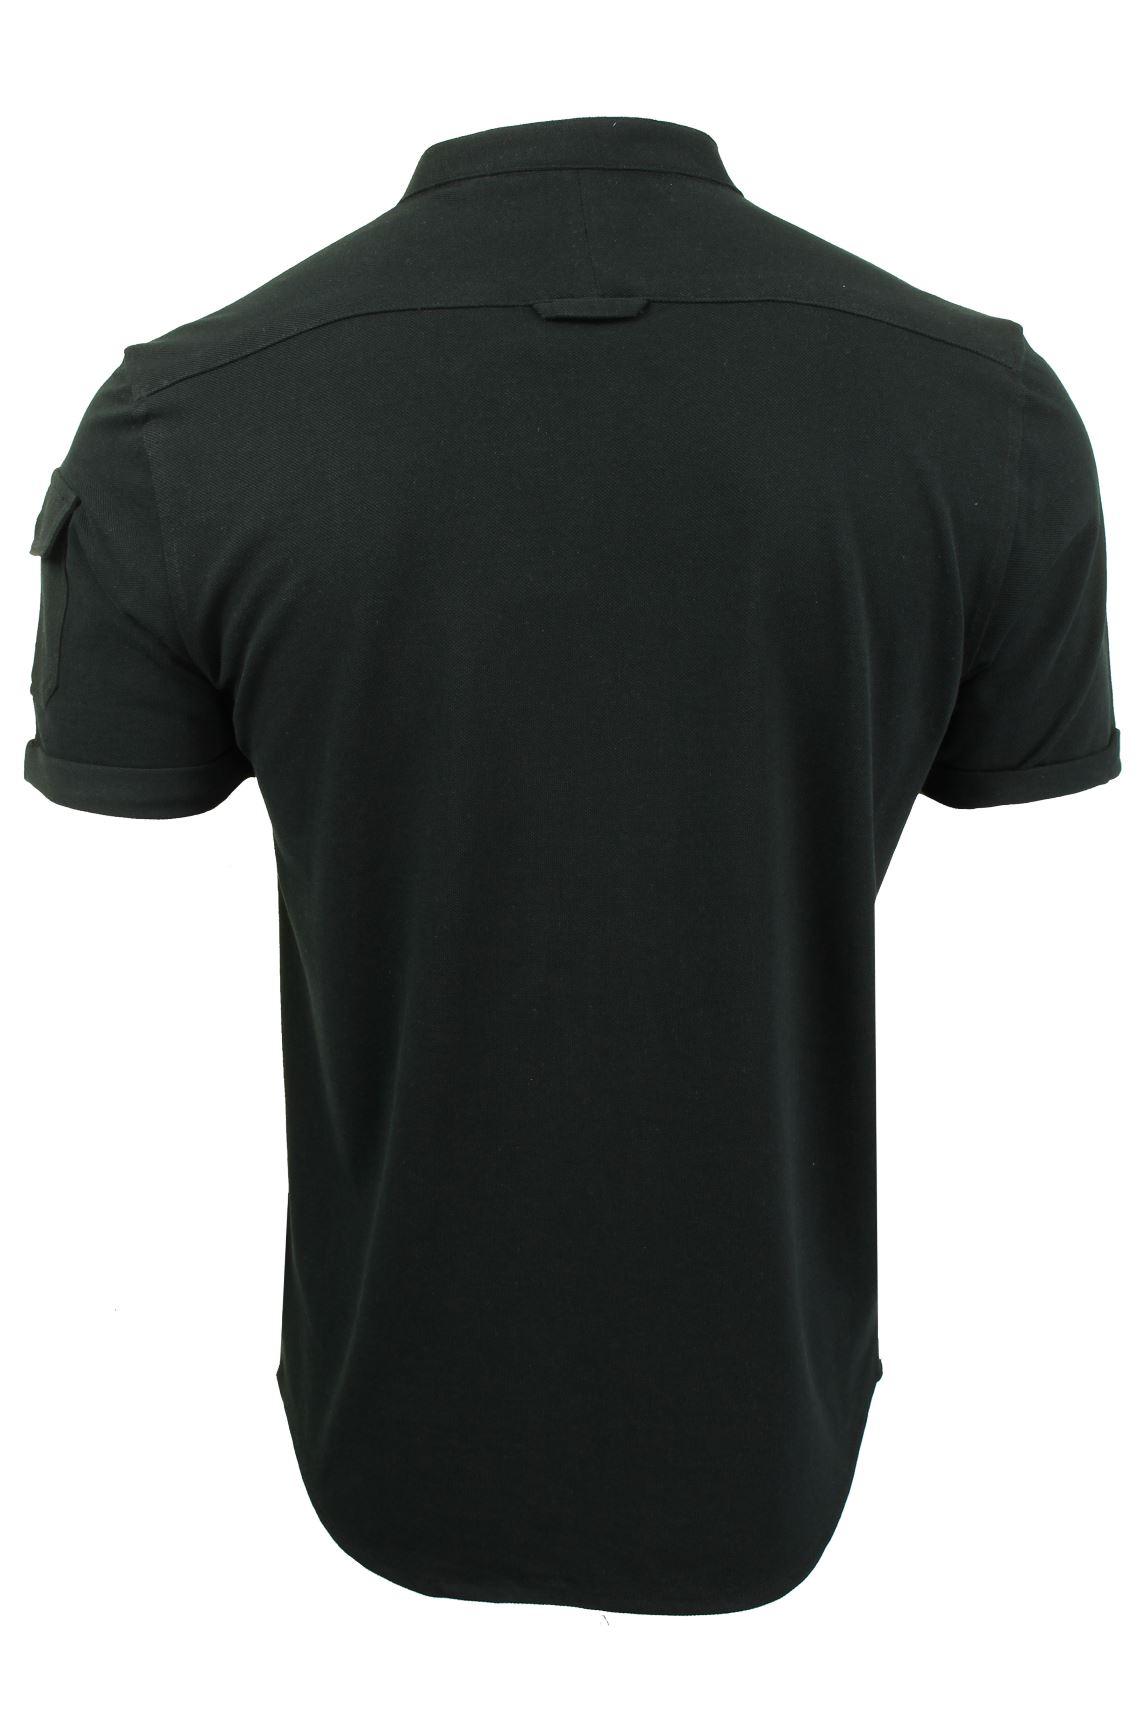 Mens-Grandad-Collar-Pique-Shirt-by-Brave-Soul-039-Joey-039 thumbnail 5